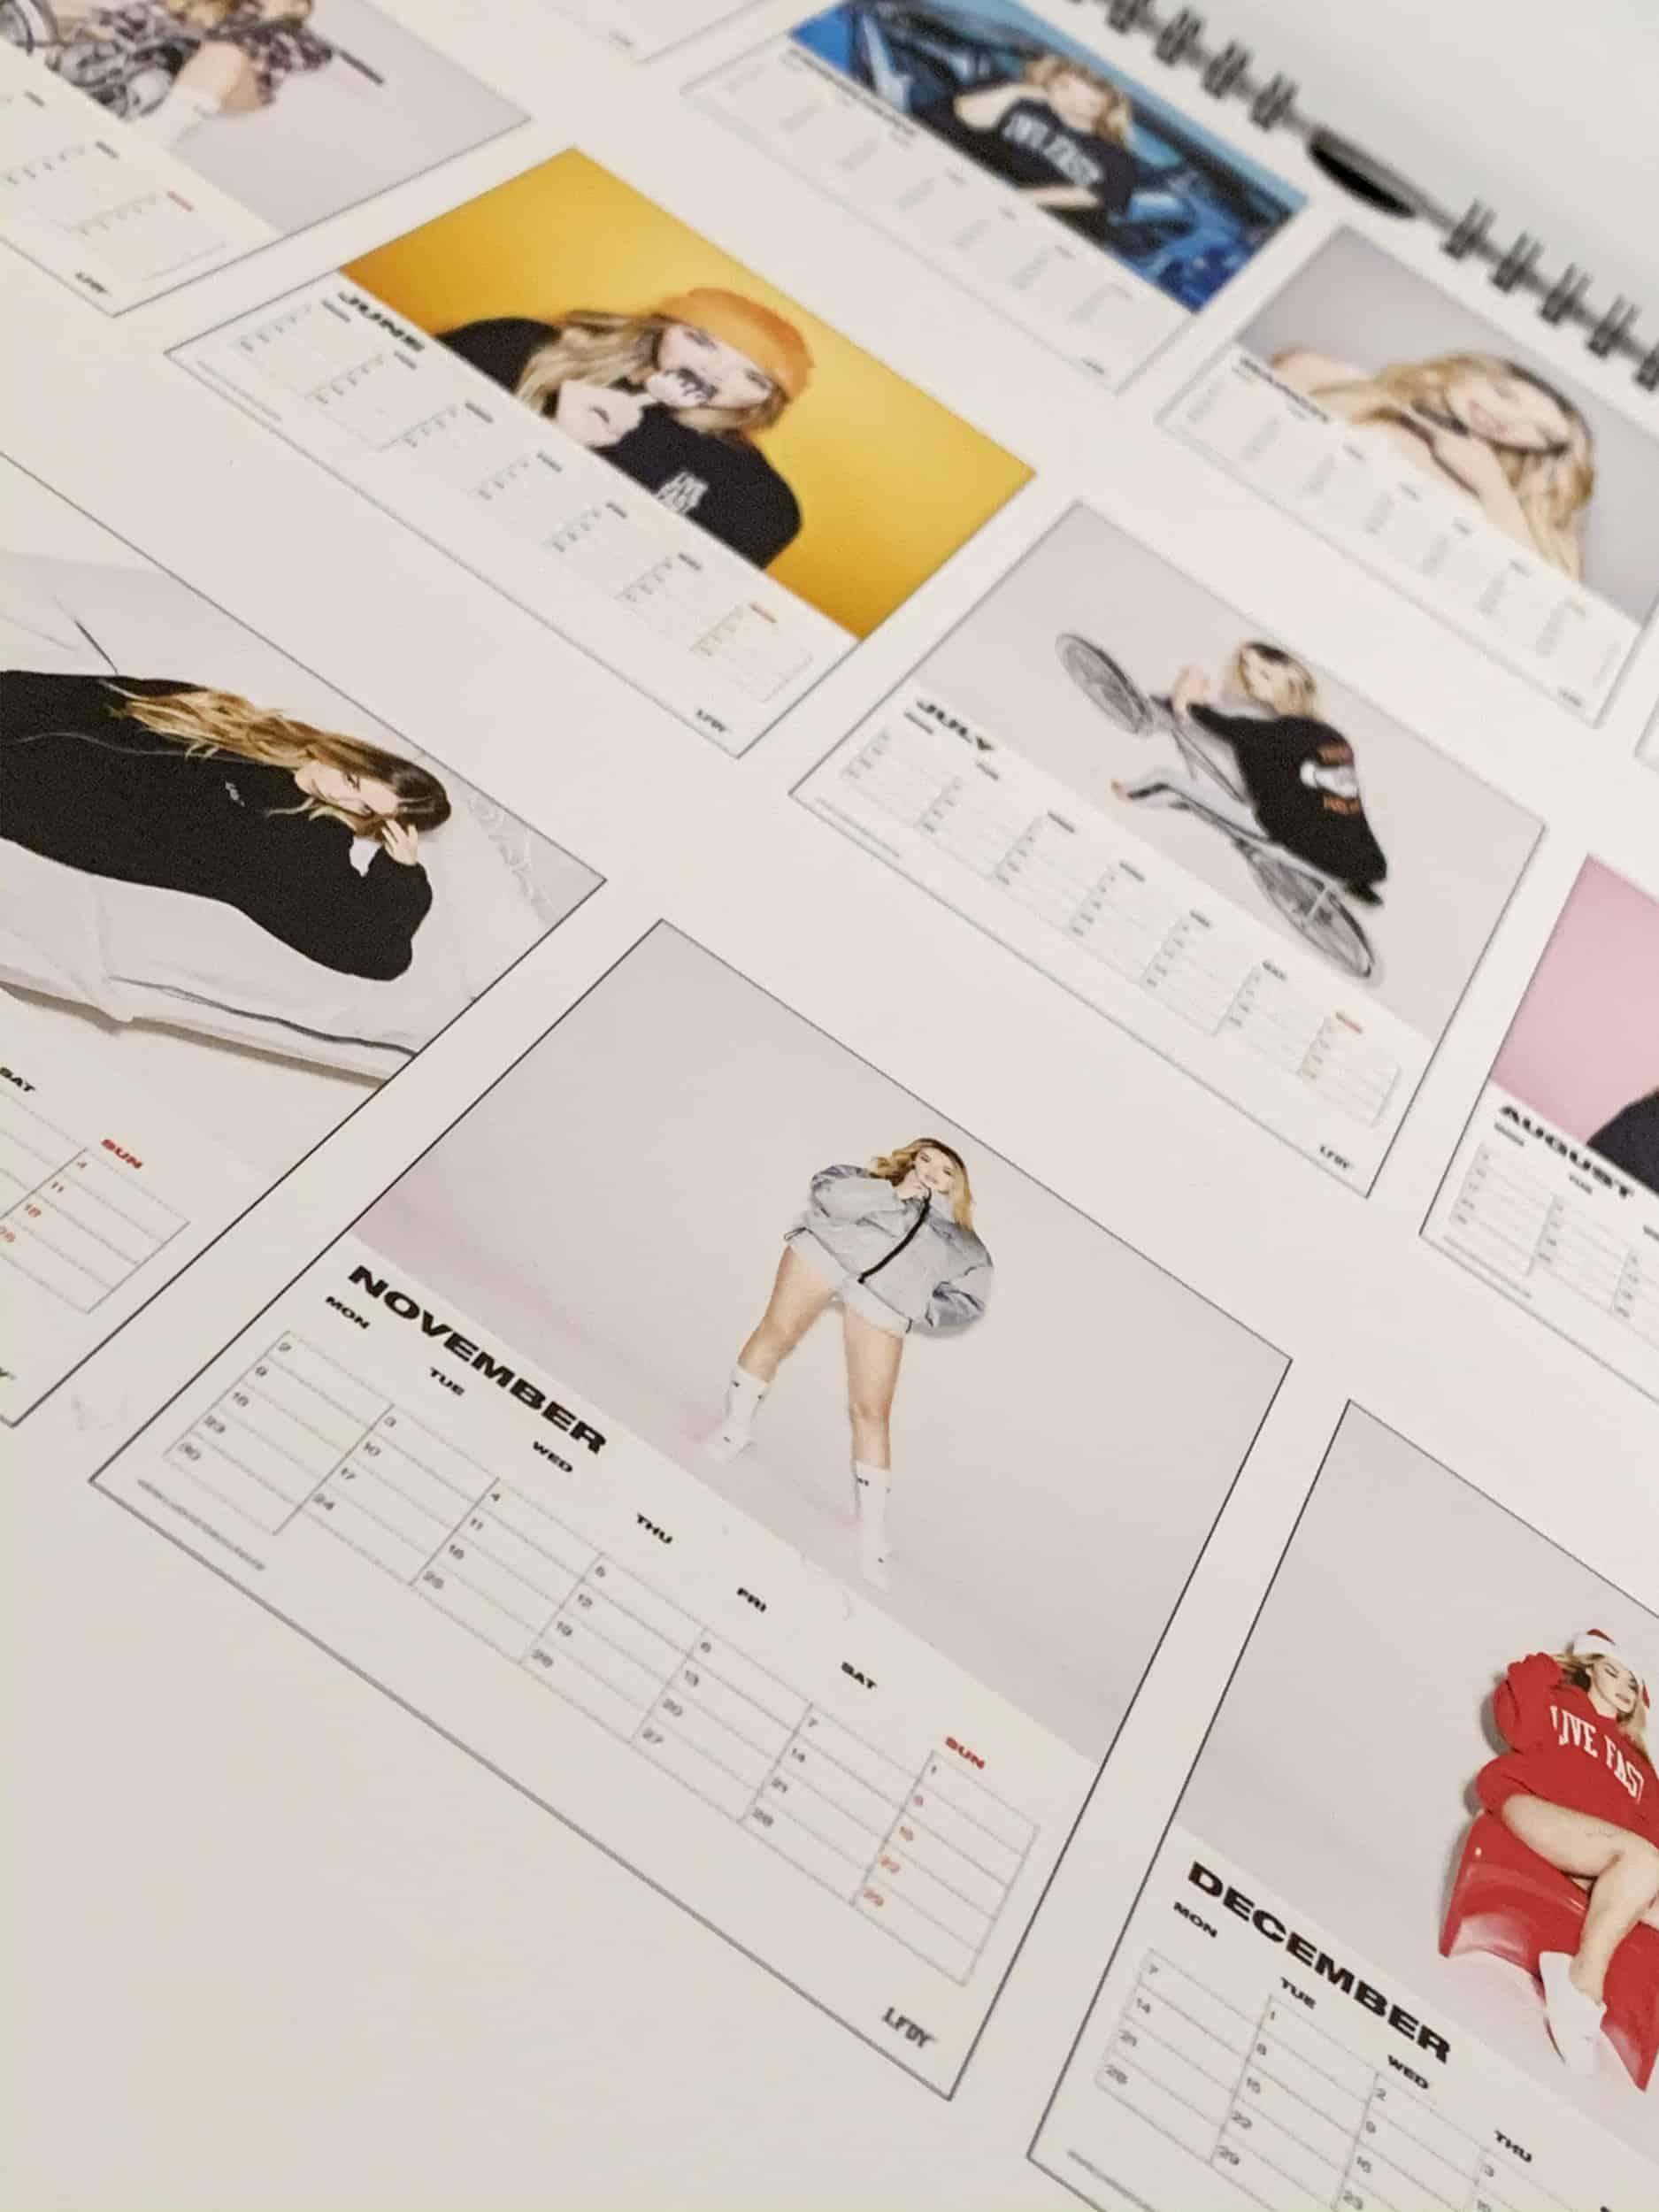 studio-ignatov-LFDY-enisa-bukvic-product-calendar2020-04